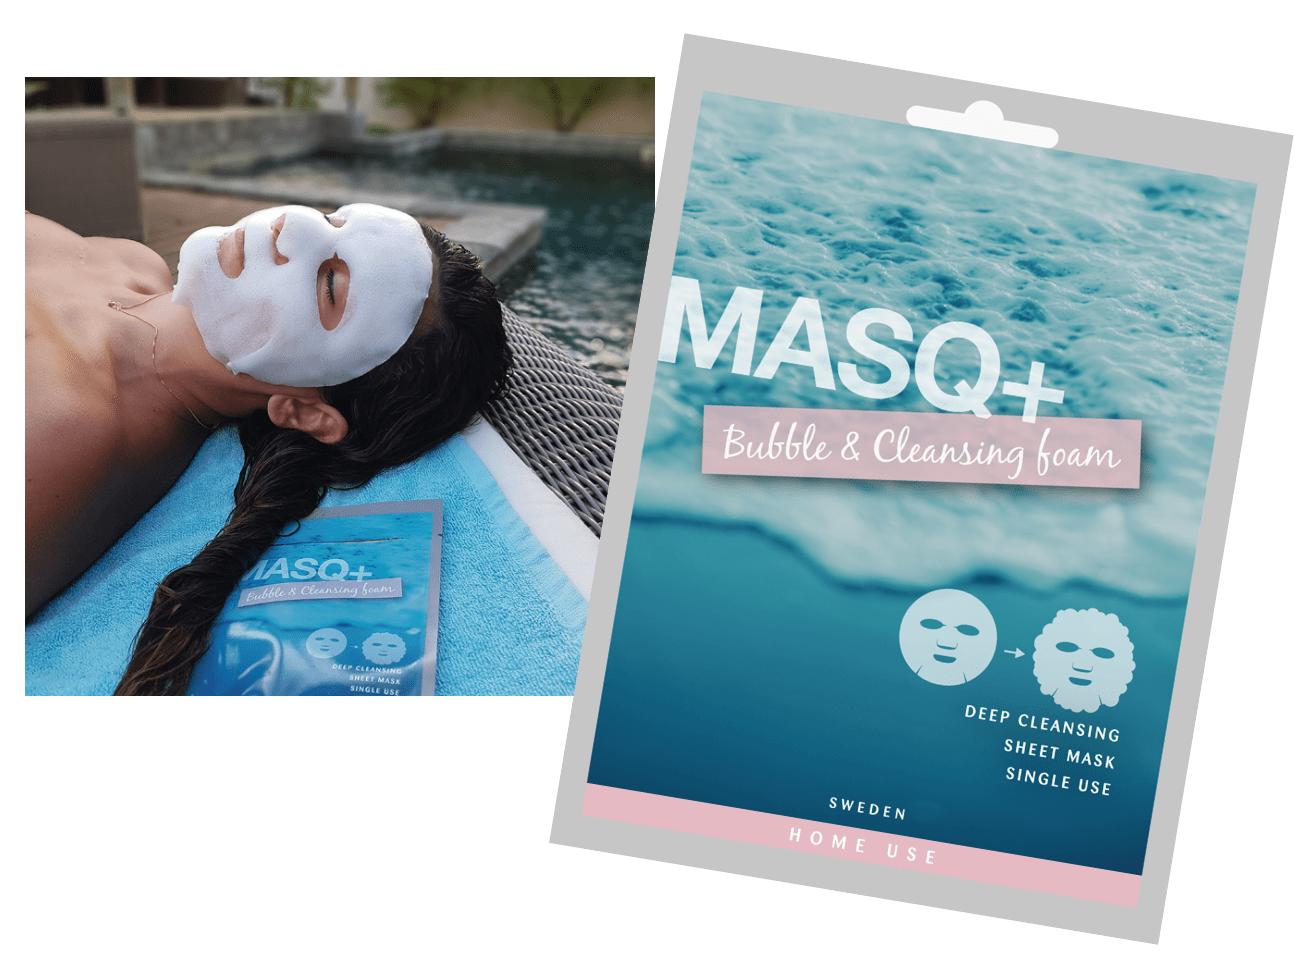 Glossybox testar MASQ+